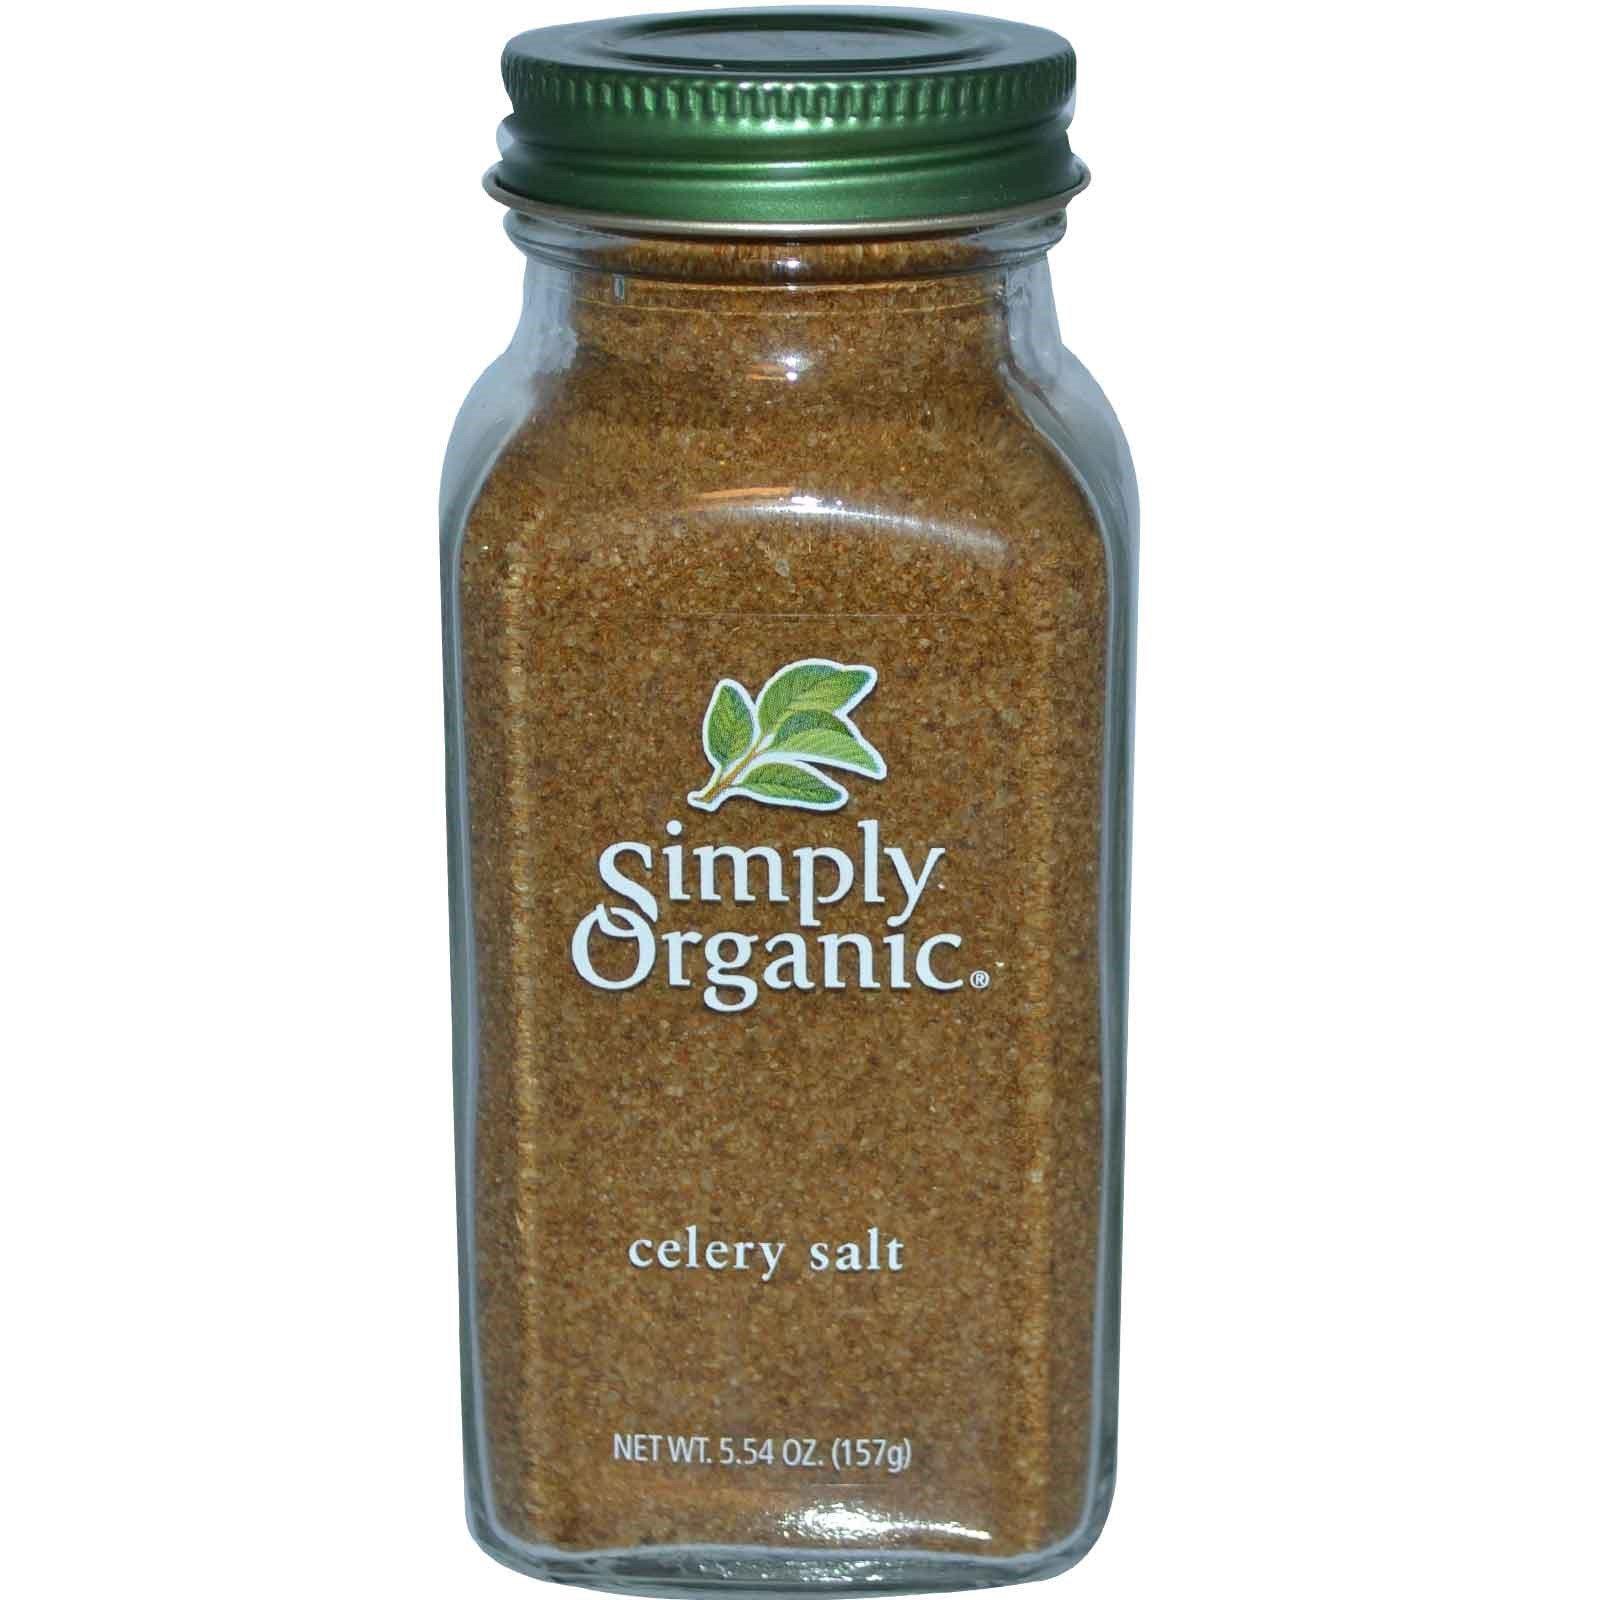 Simply Organic, Celery Salt, 5.54 oz(Pack of 2)